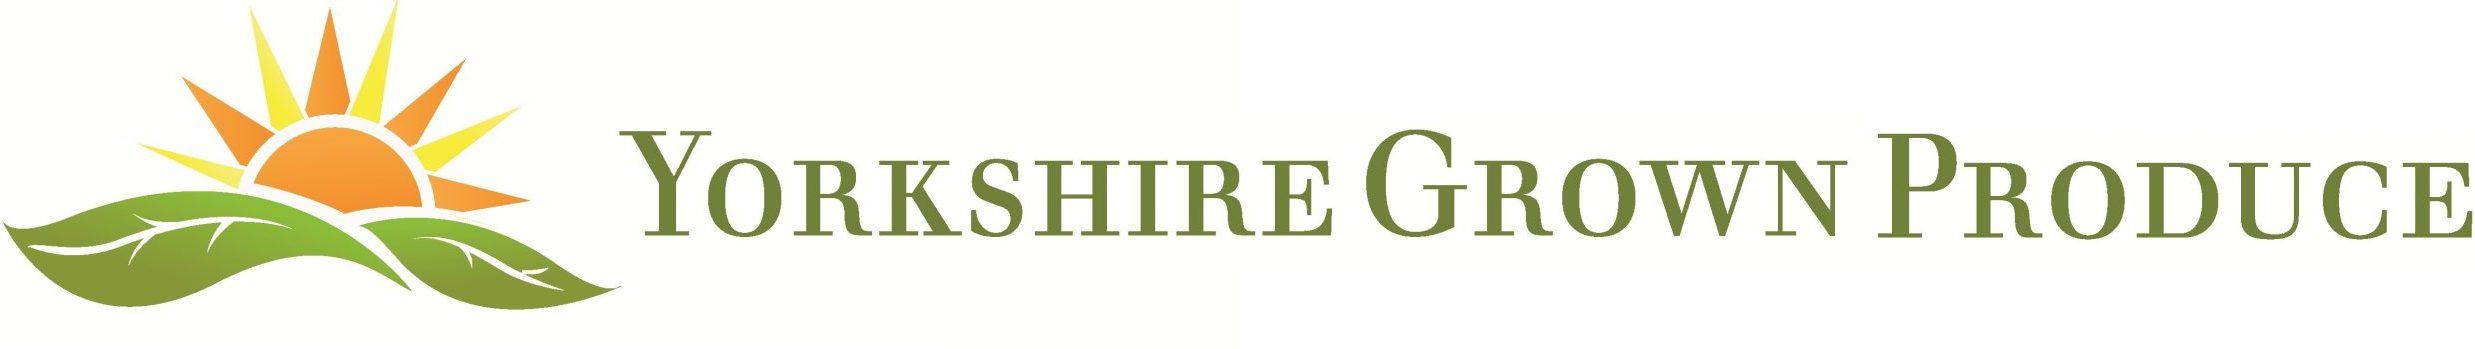 Yorkshire Grown Produce Ltd